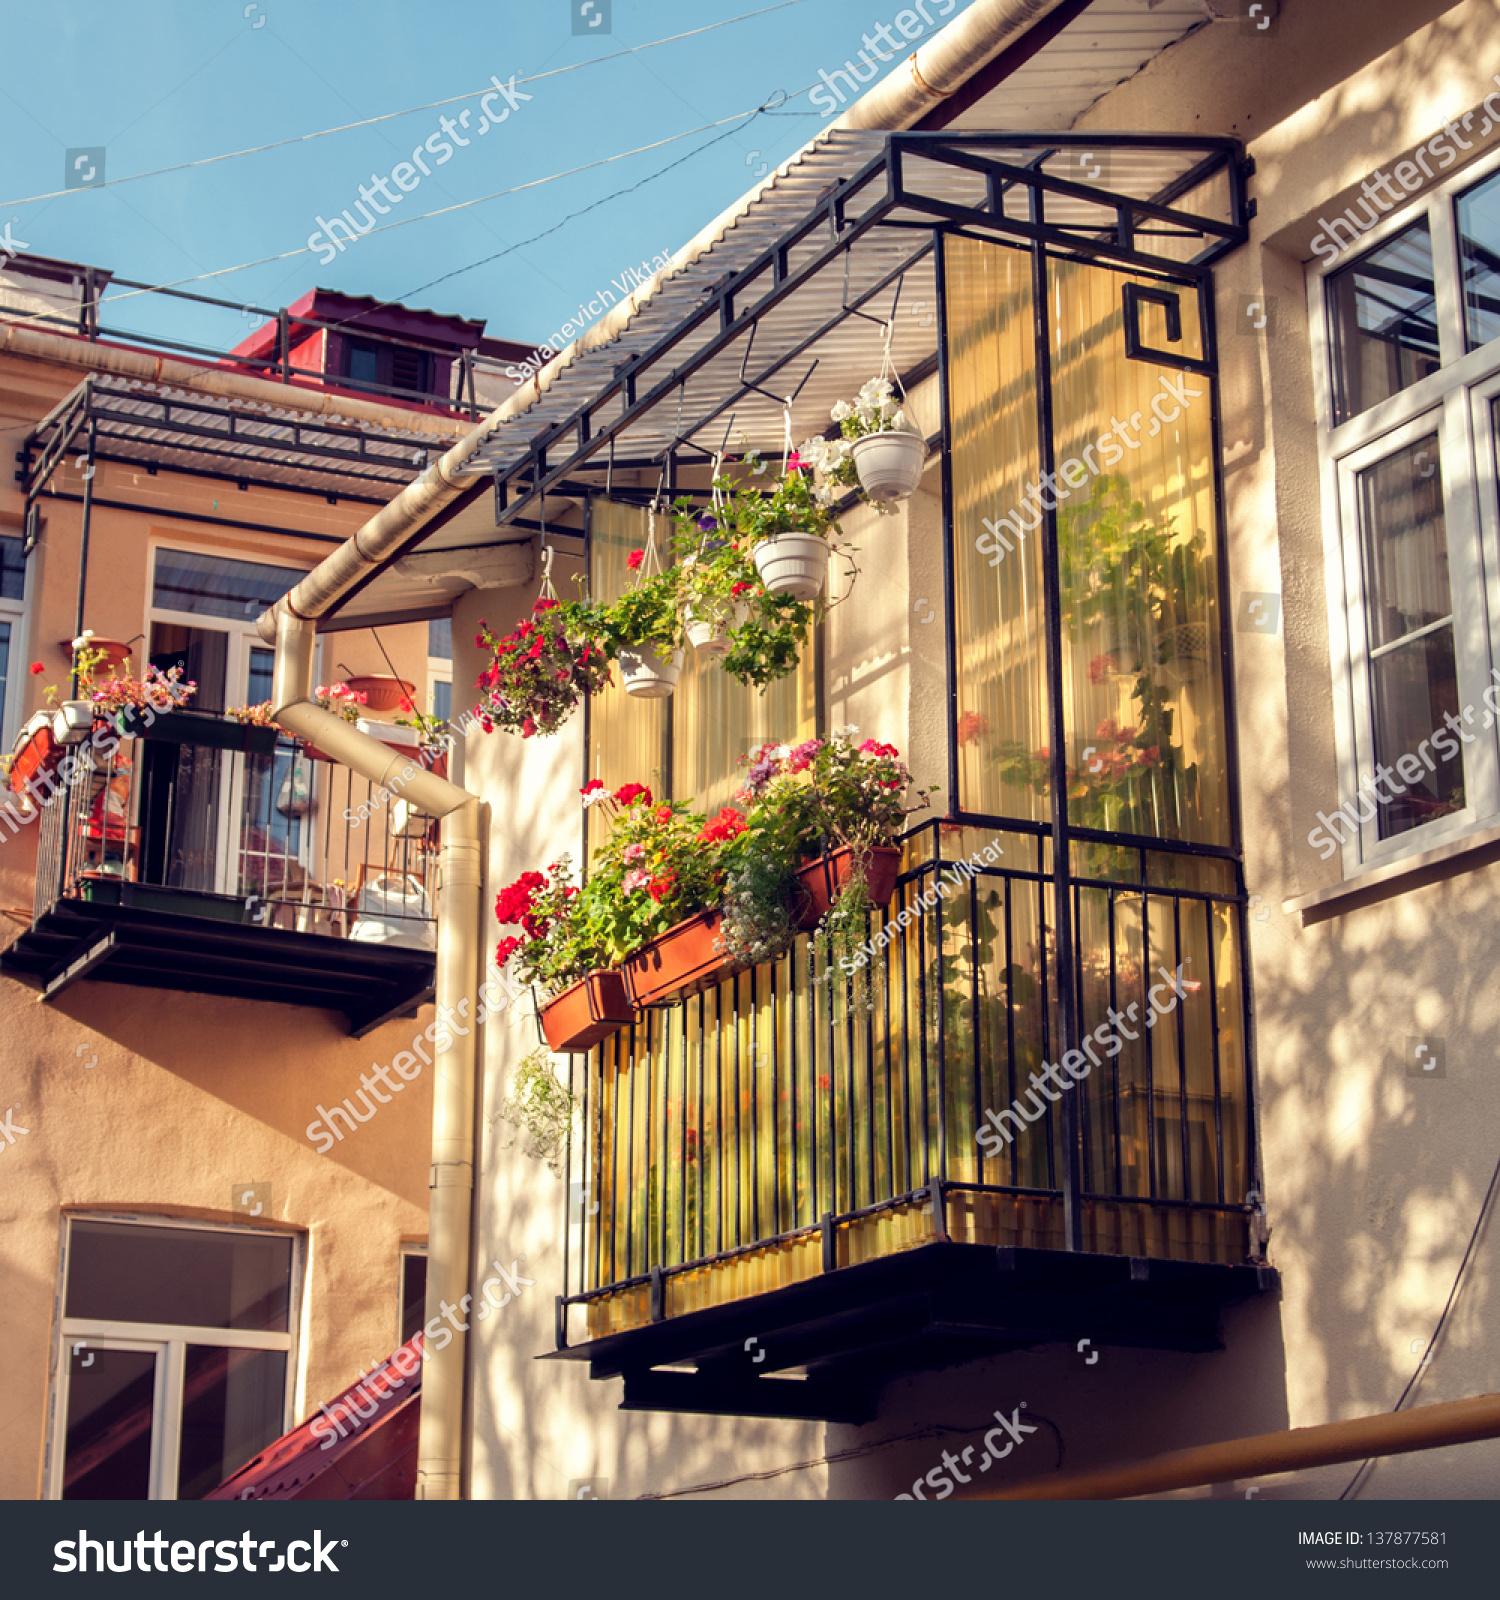 How to warm the balcony 25